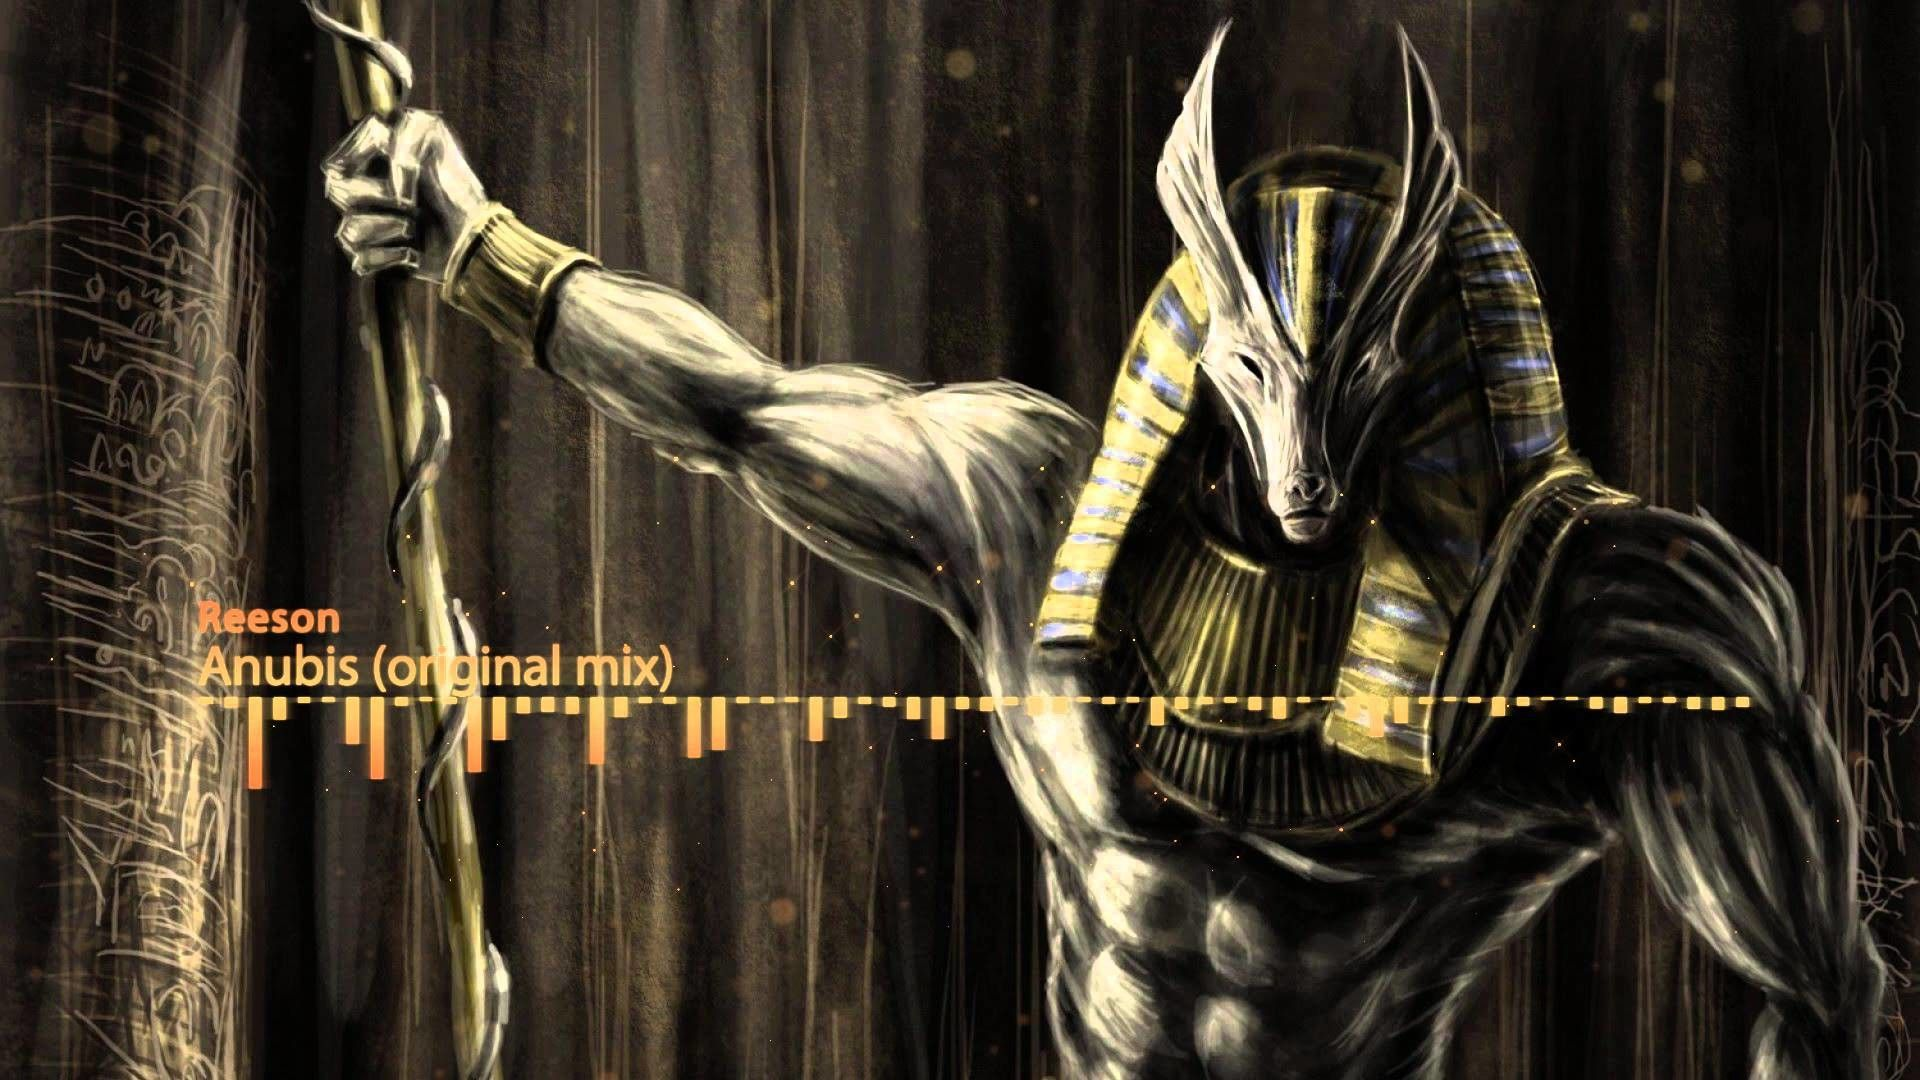 Anubis Egyptian God Wallpapers Top Free Anubis Egyptian